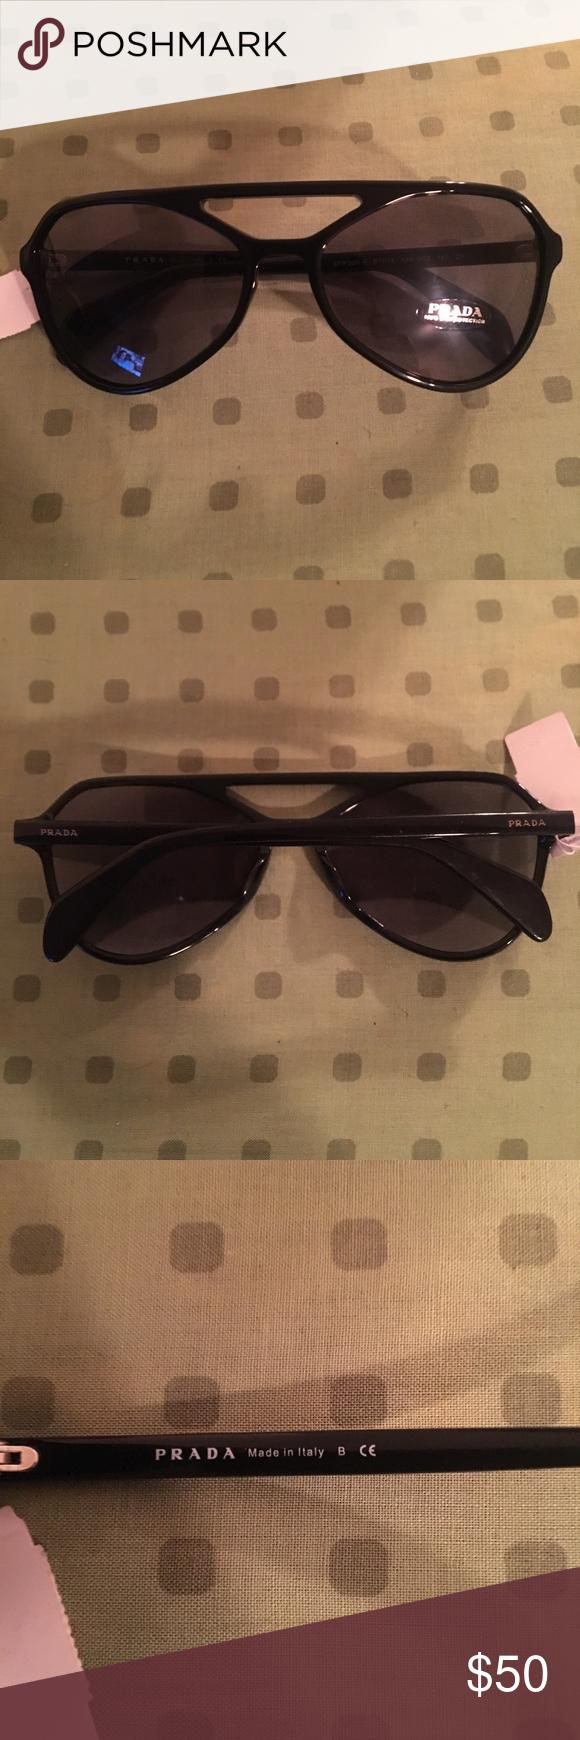 0ca16606dfdd Men s Prada Aviators Nice Aviators. Brand new. Authentic. No case. Great  deal. Prada Accessories Sunglasses